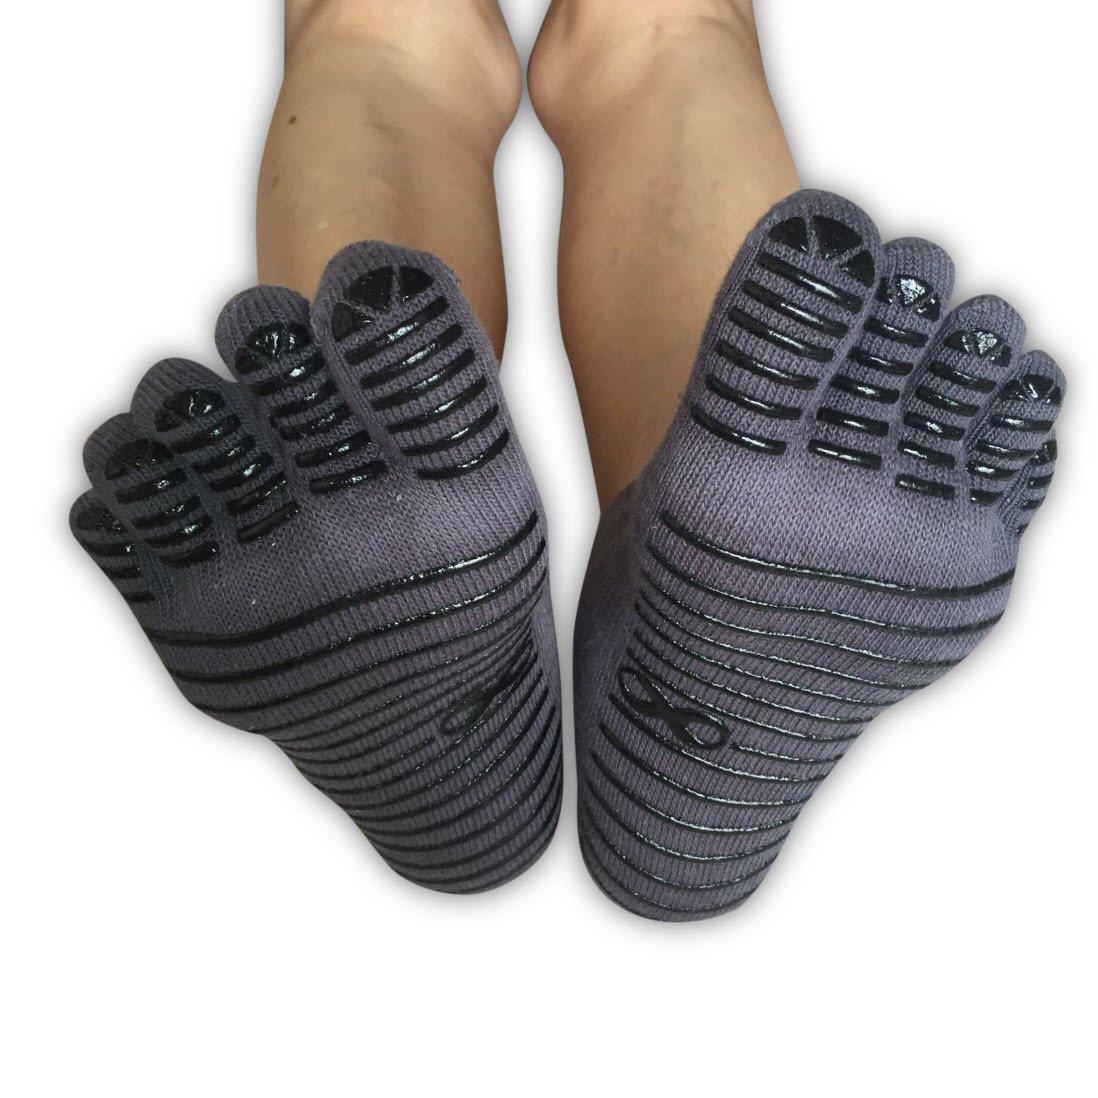 for Women /& Men 1 /& 3 Pairs Set Dance Anti Non Slip Skid -S//M Black-Pink Lines Black-Green Lines White Pilates Full Toe Socks with Grips YogaAddict Yoga Barre